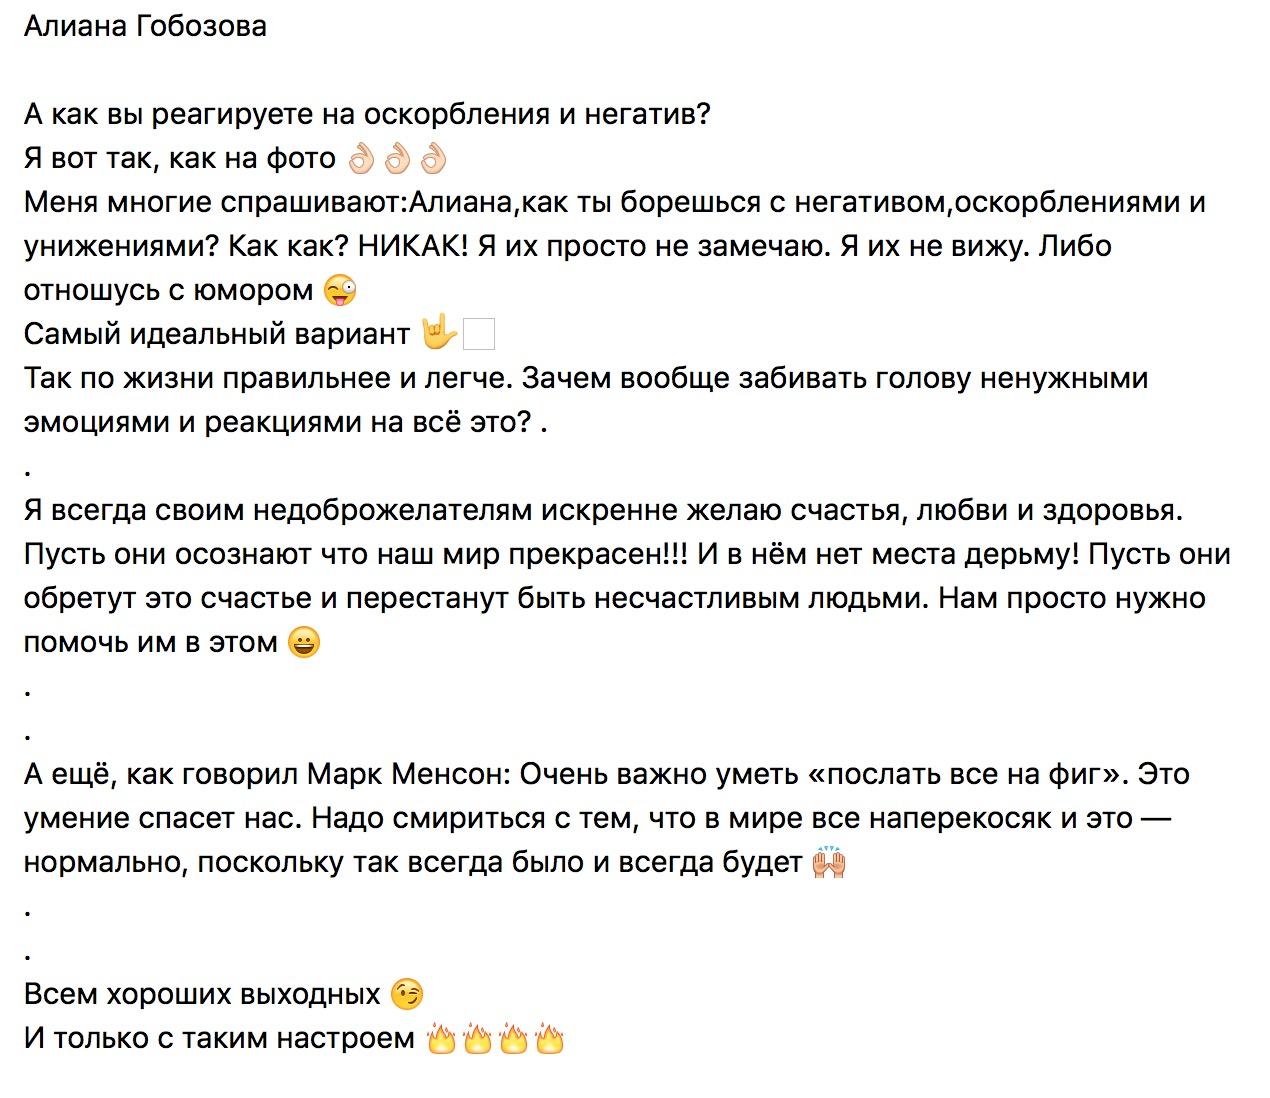 Алиана Гобозова о хейтерах